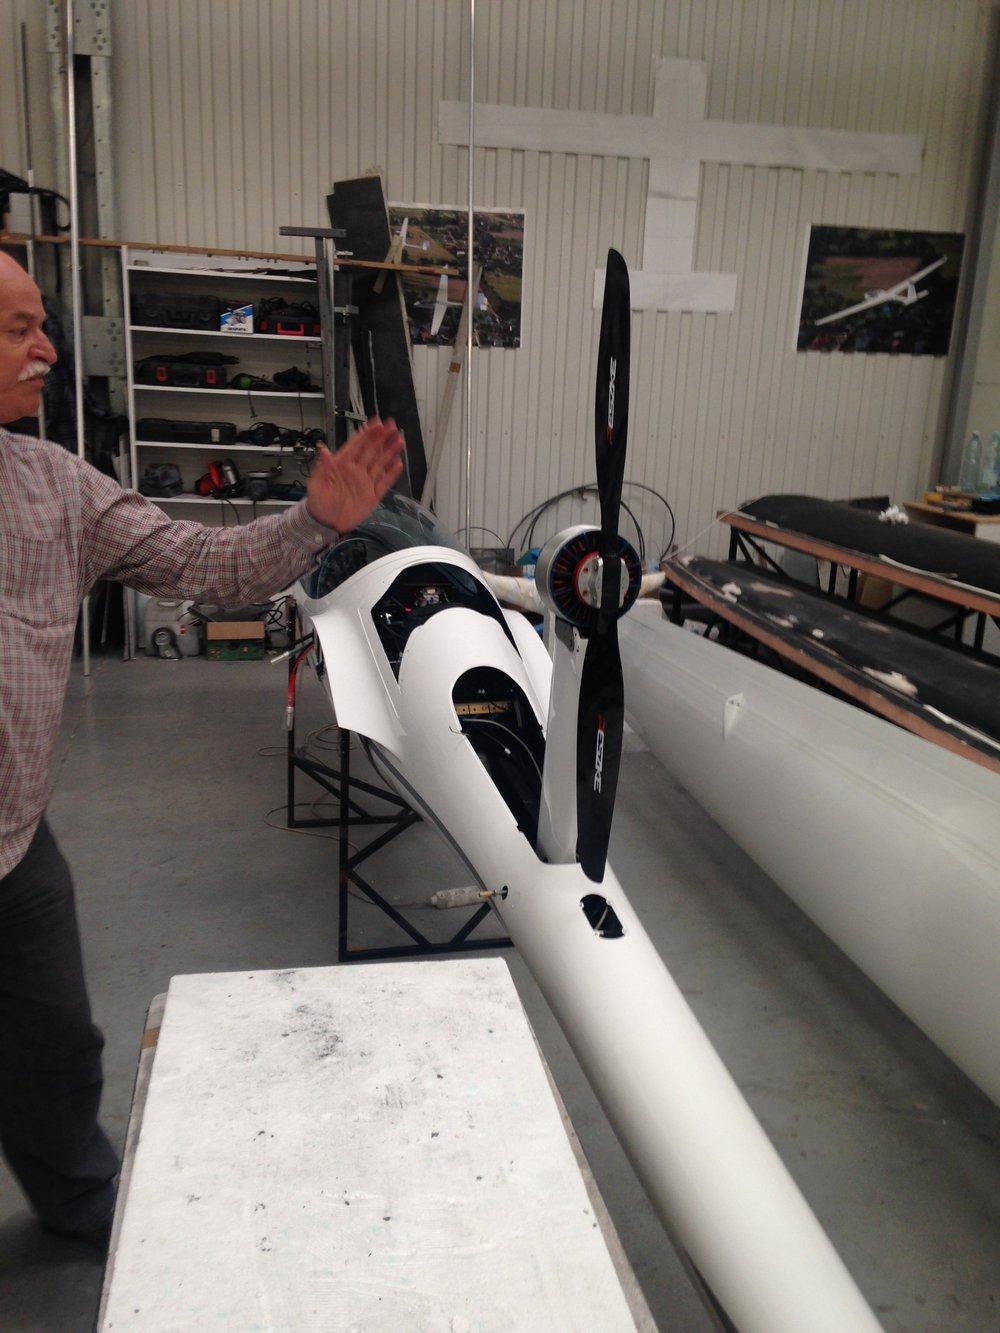 Grzegorz Peszke explains details of gettingthe thrust line correct